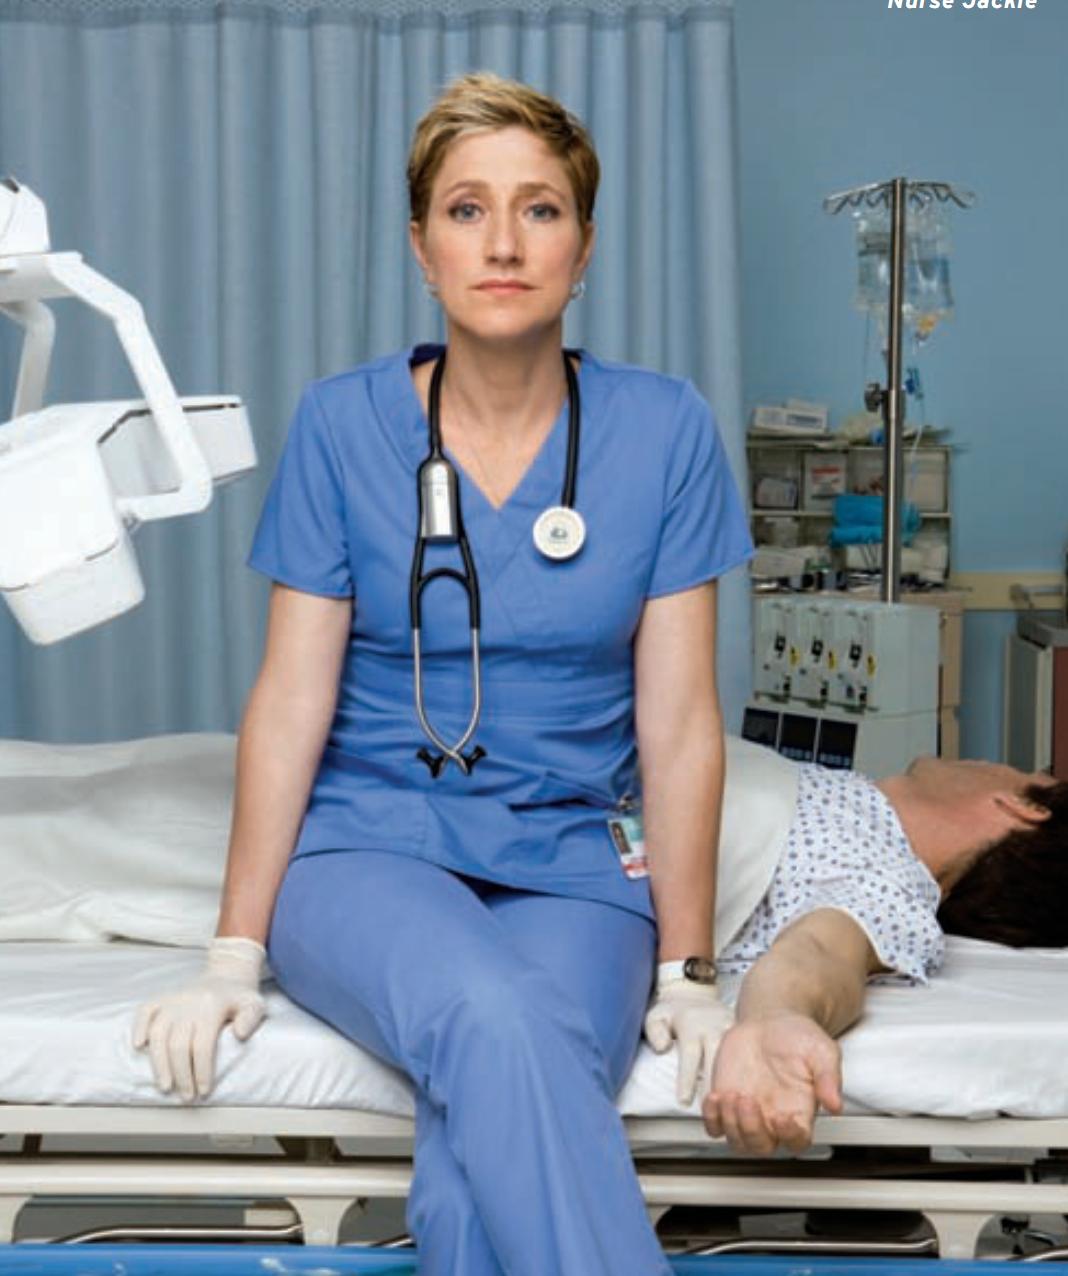 Nurse Jackie, Come Quick